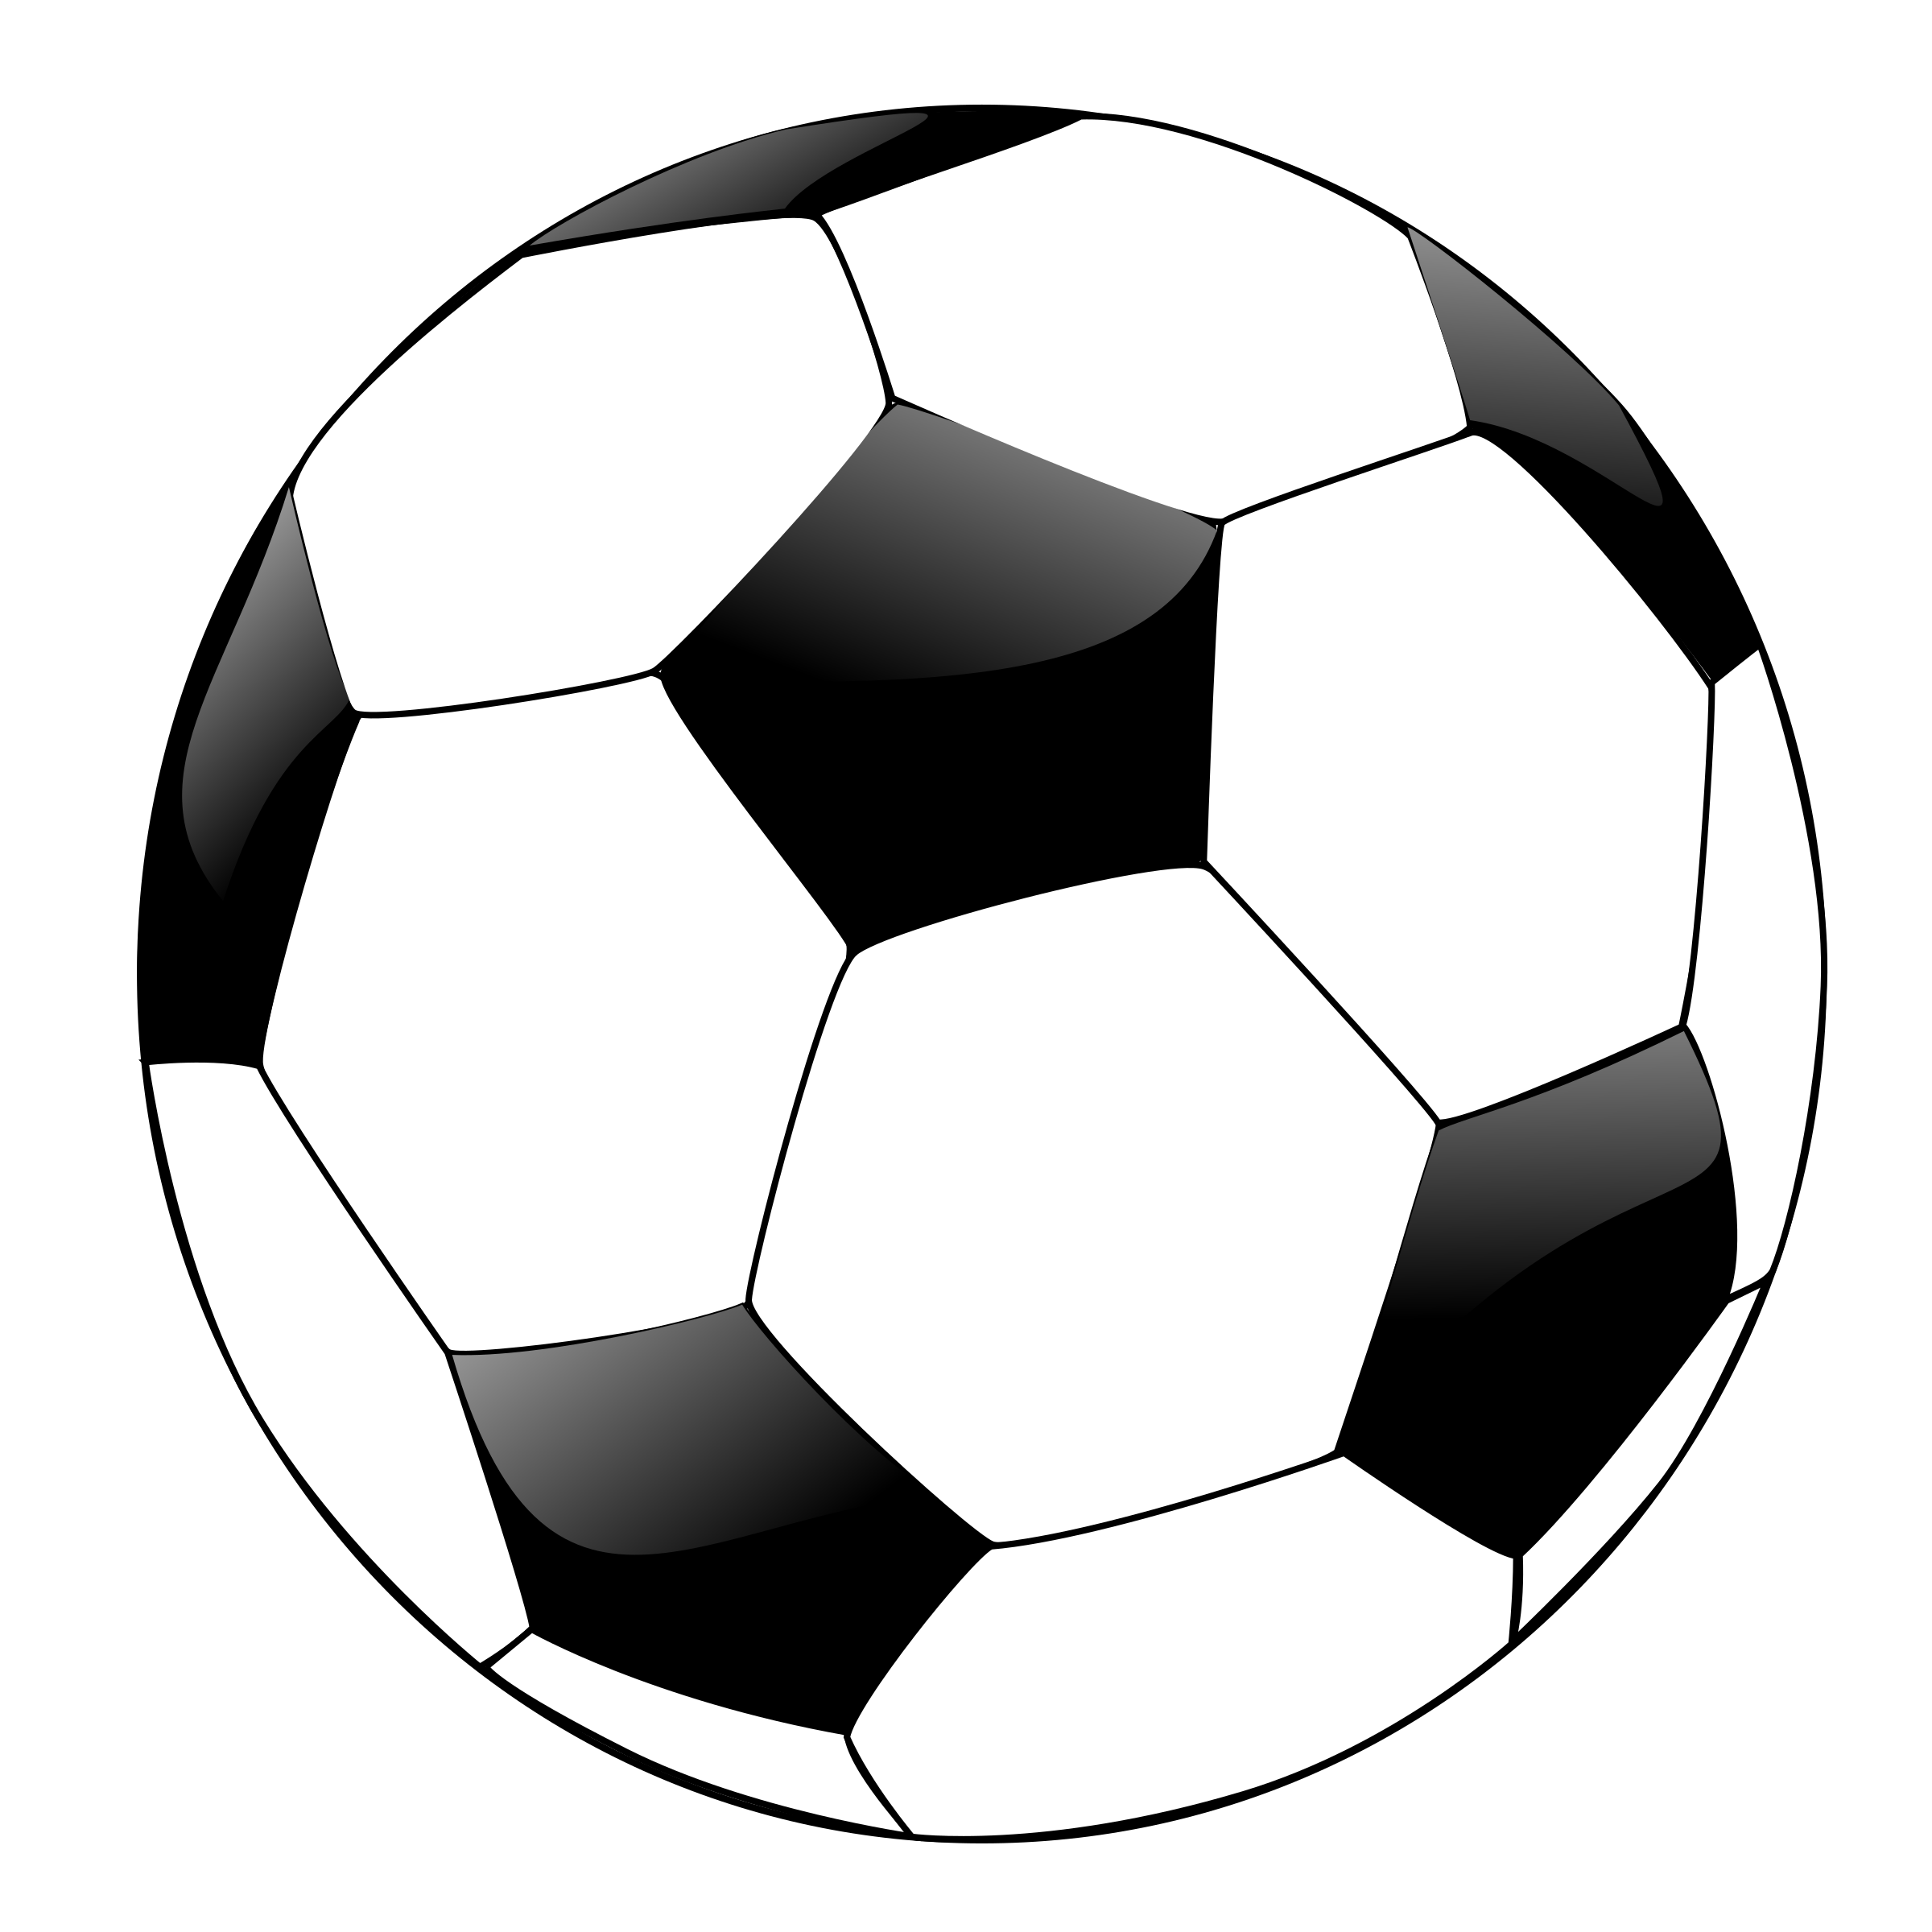 . Clipart football basketball